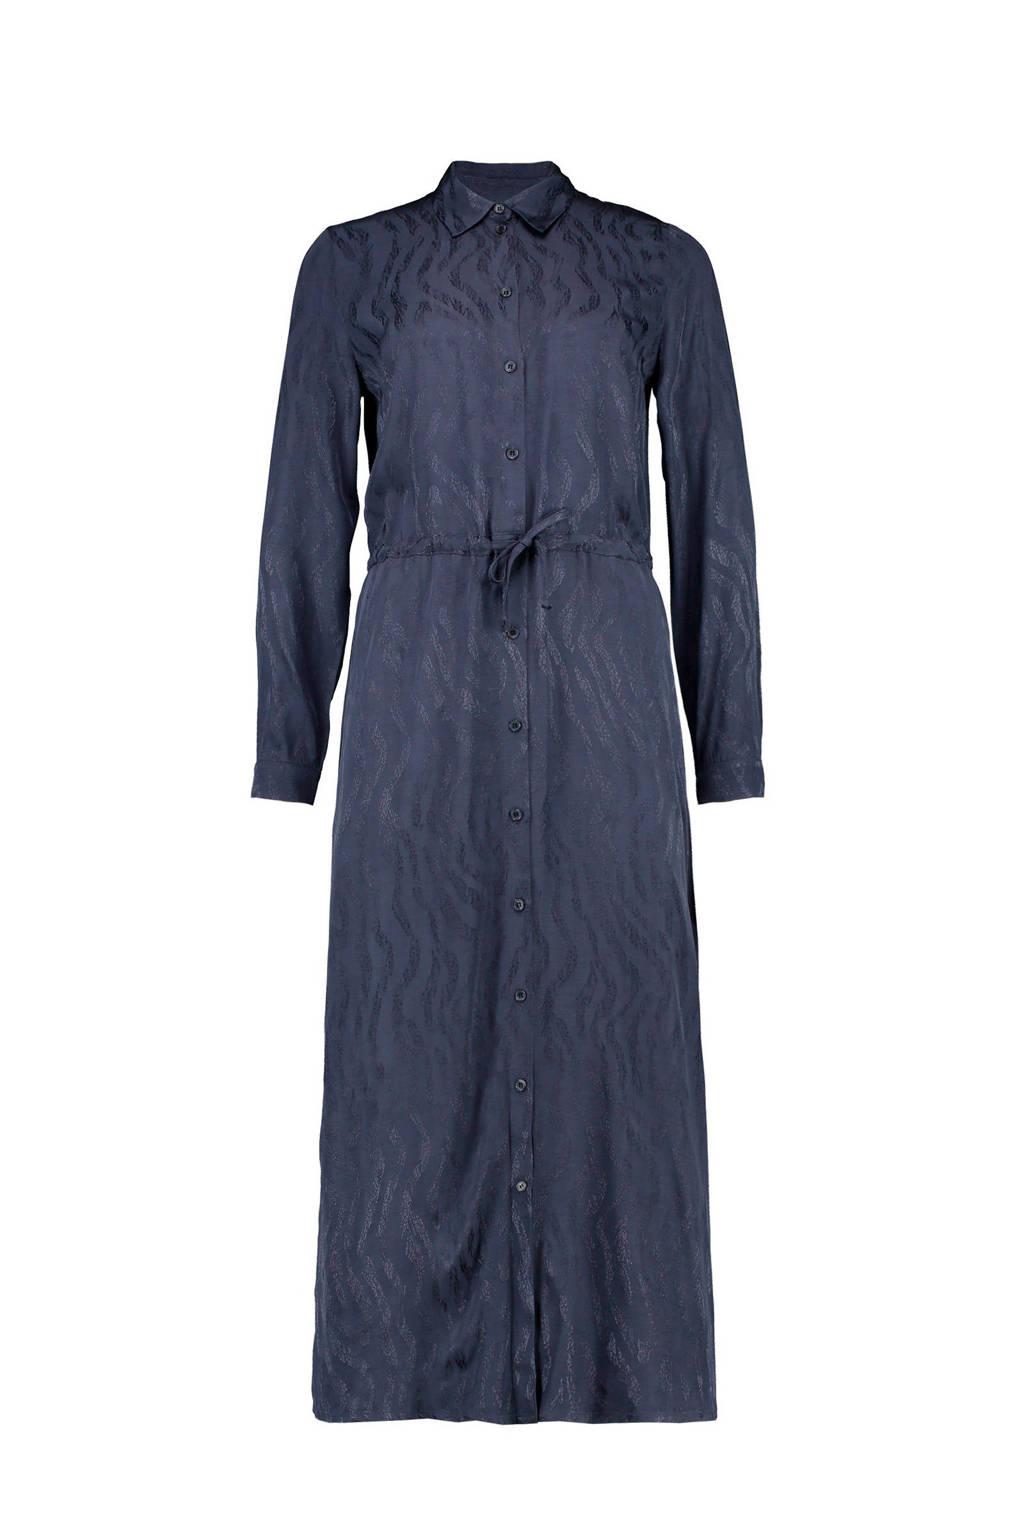 CKS blousejurk met all over print donkerblauw, Donkerblauw